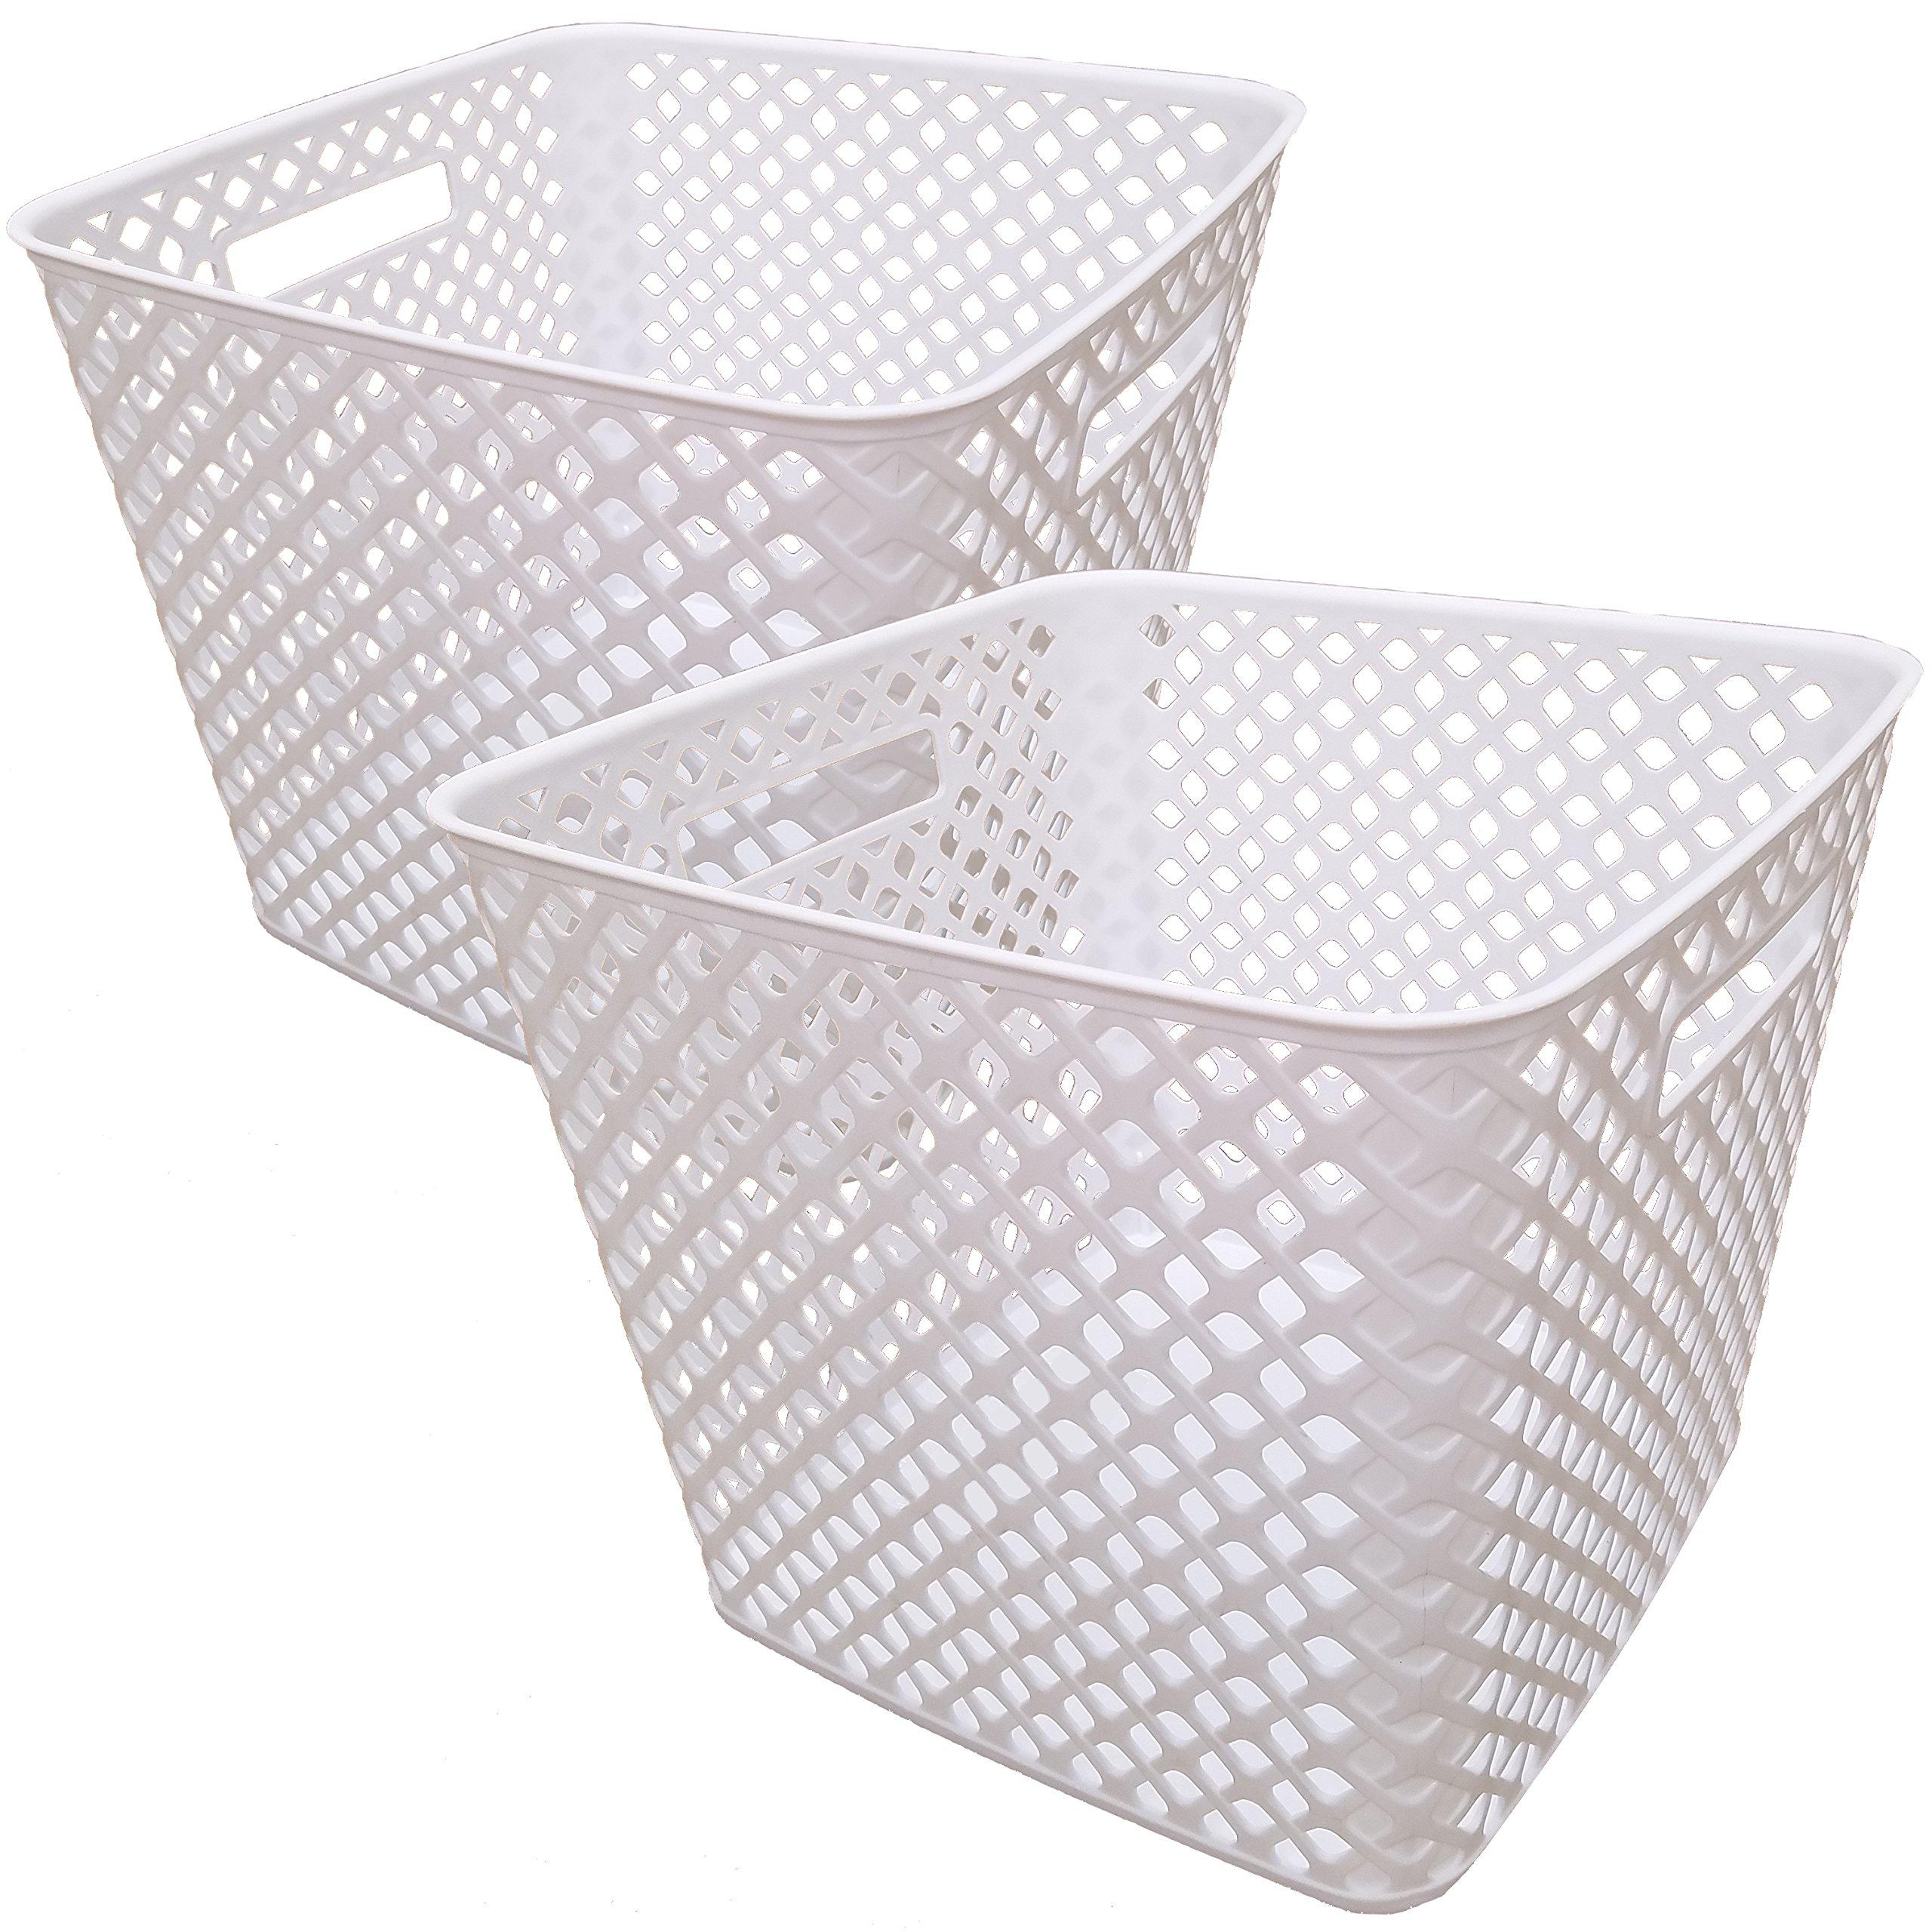 Starplast Square Cube Deco Baskets - White, 2 Pack